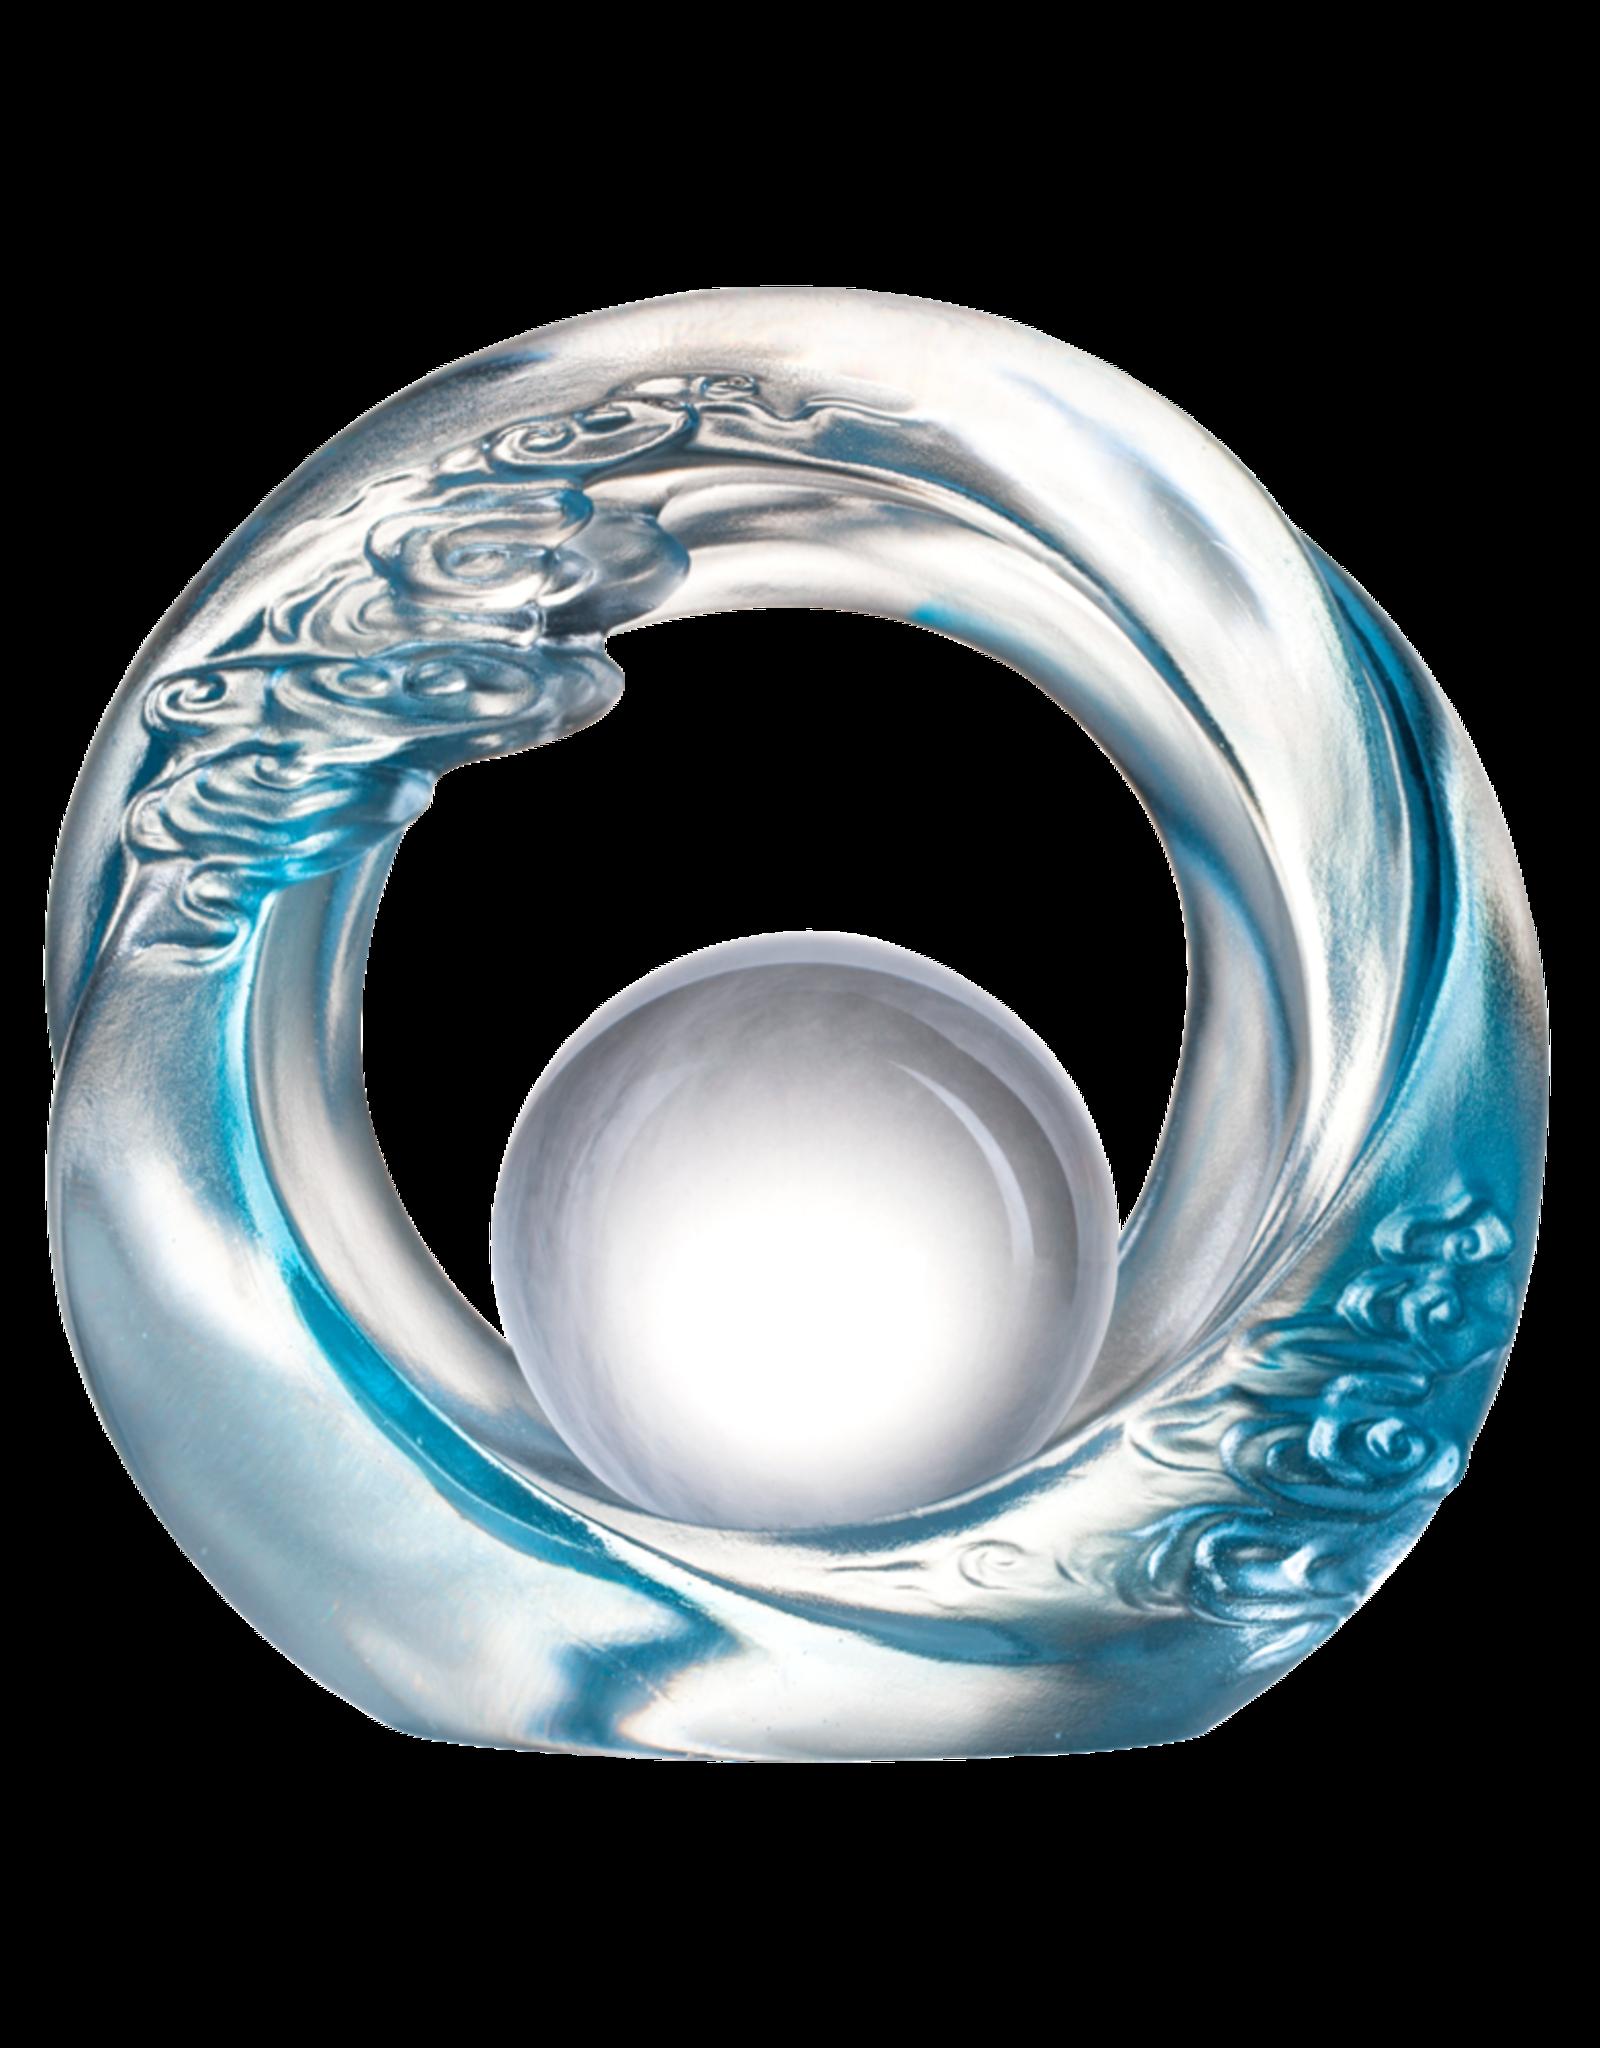 LIULI Crystal Art Crystal Abstract Cloud Feng Shui Desk Sculpture